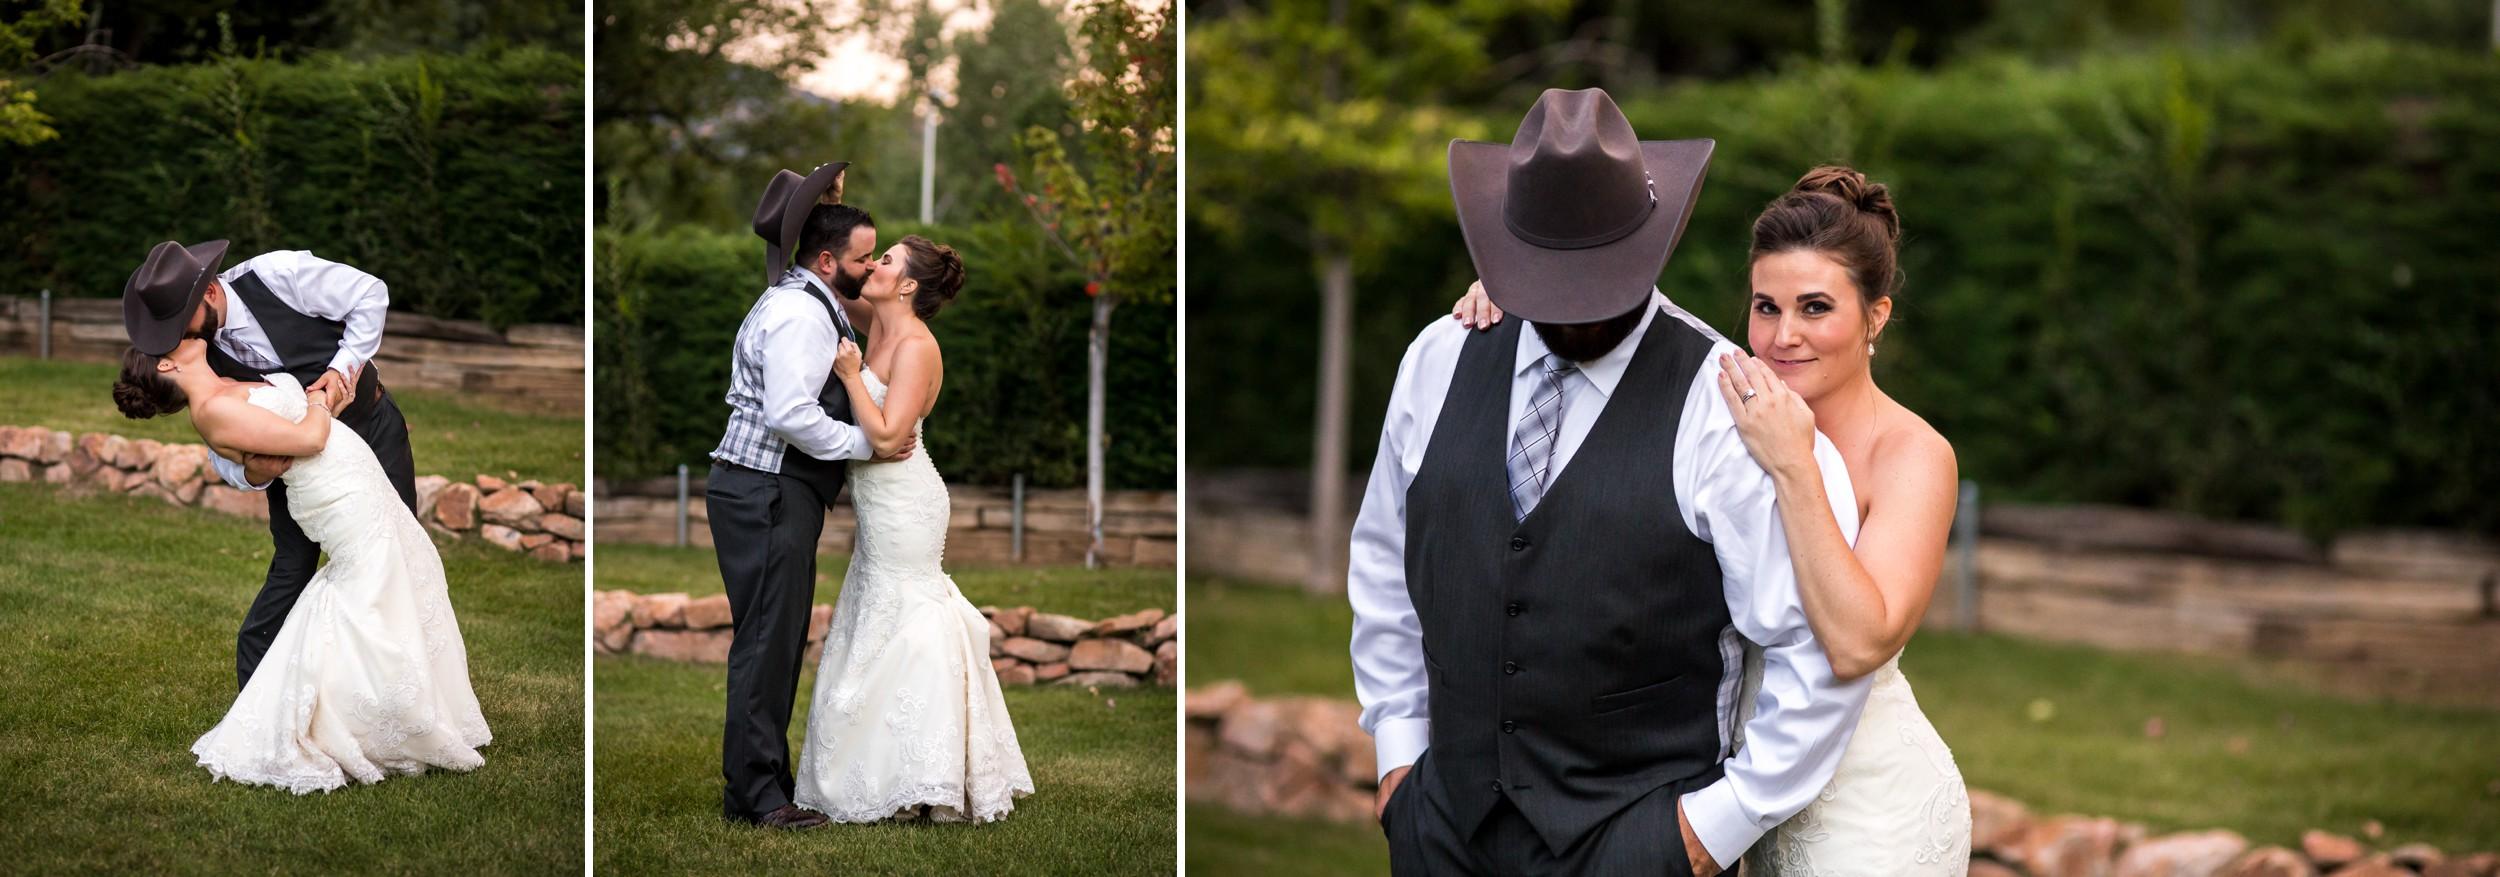 Criddle Wedding 19.jpg